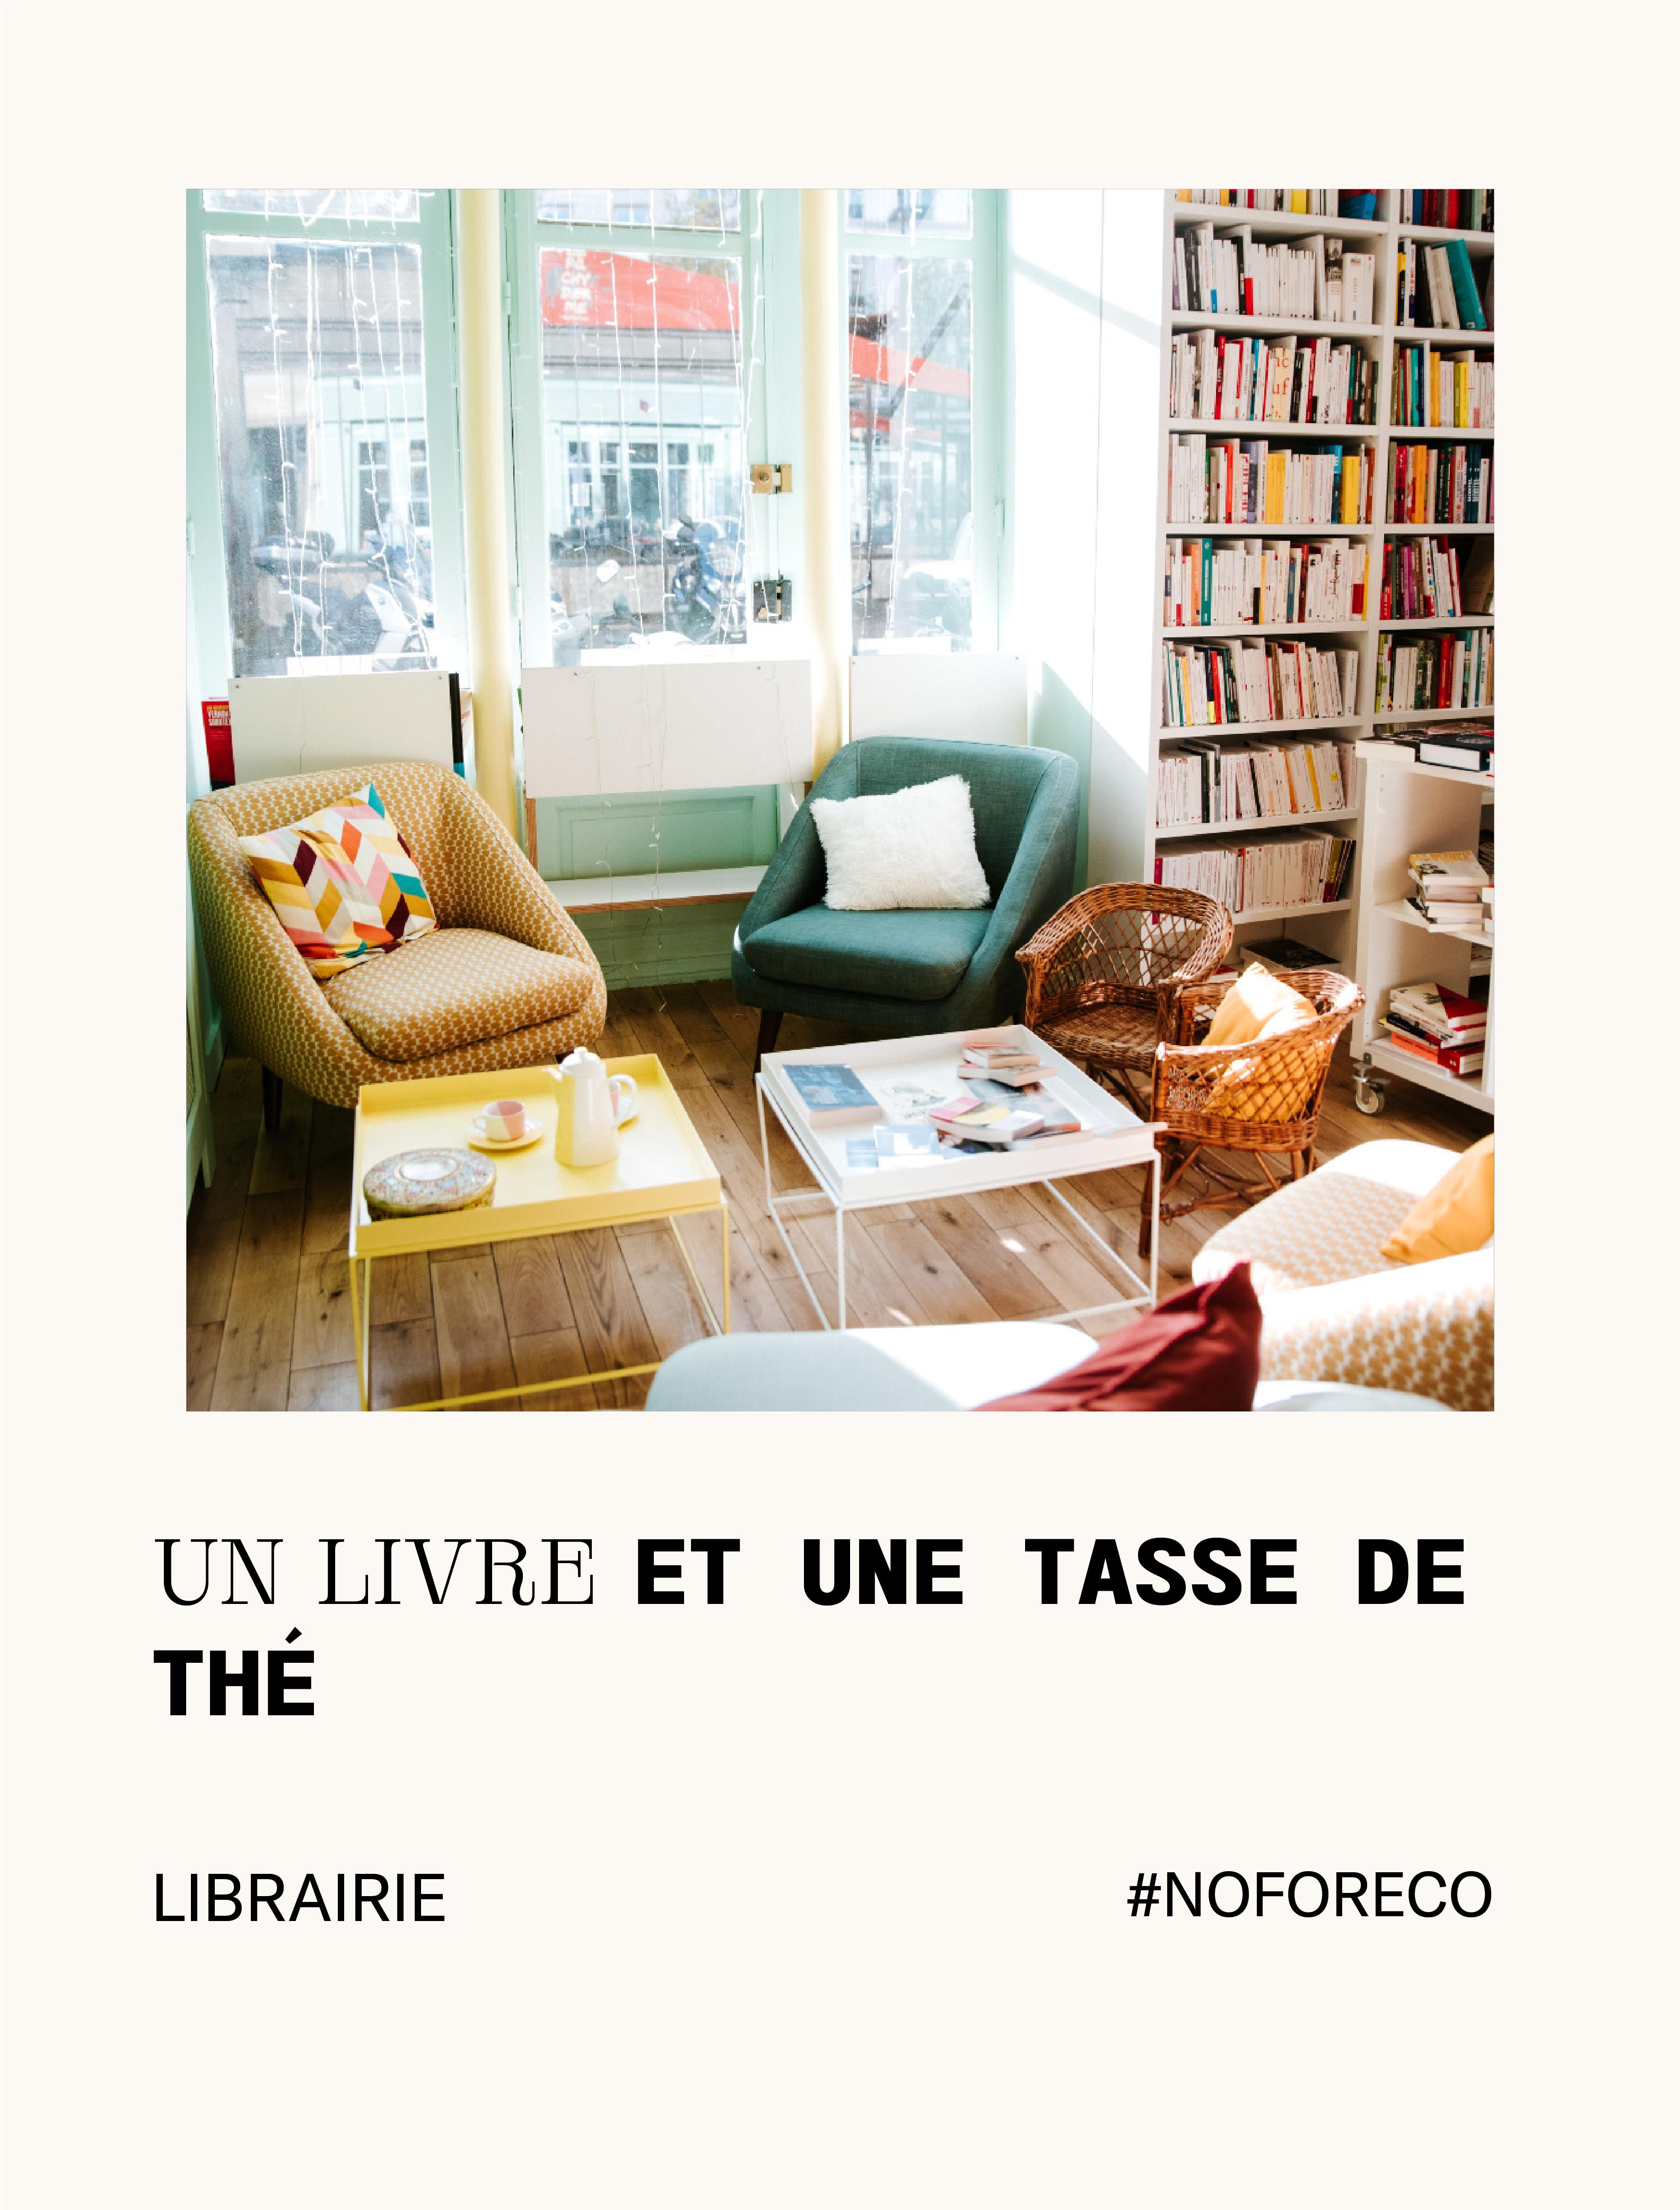 librairie_visuel_livres